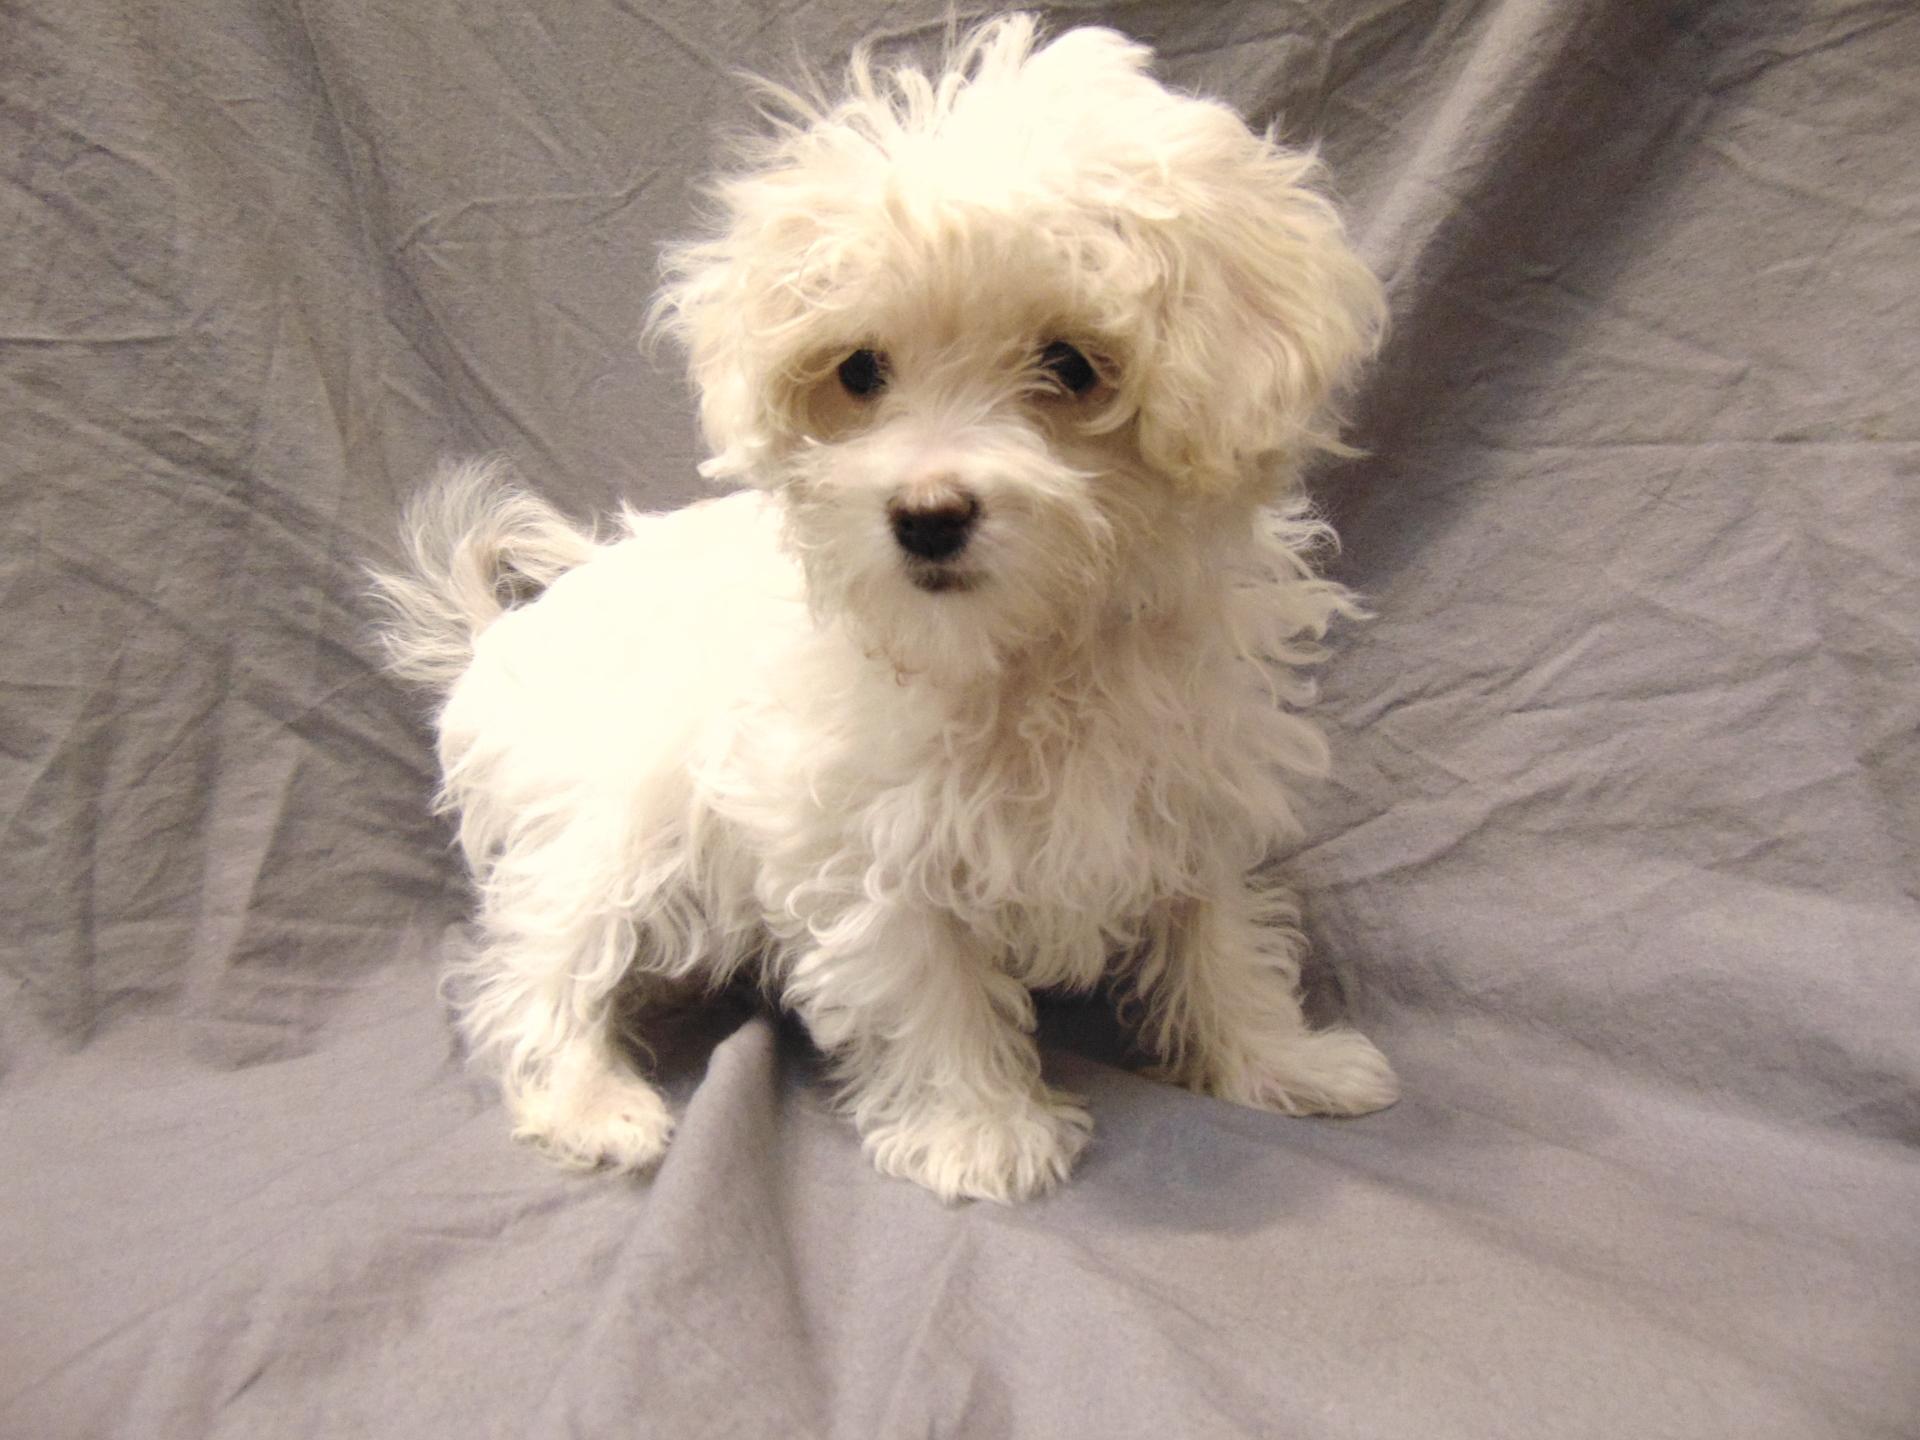 #0021 - Female Malti-Poo (Maltese/Poodle)